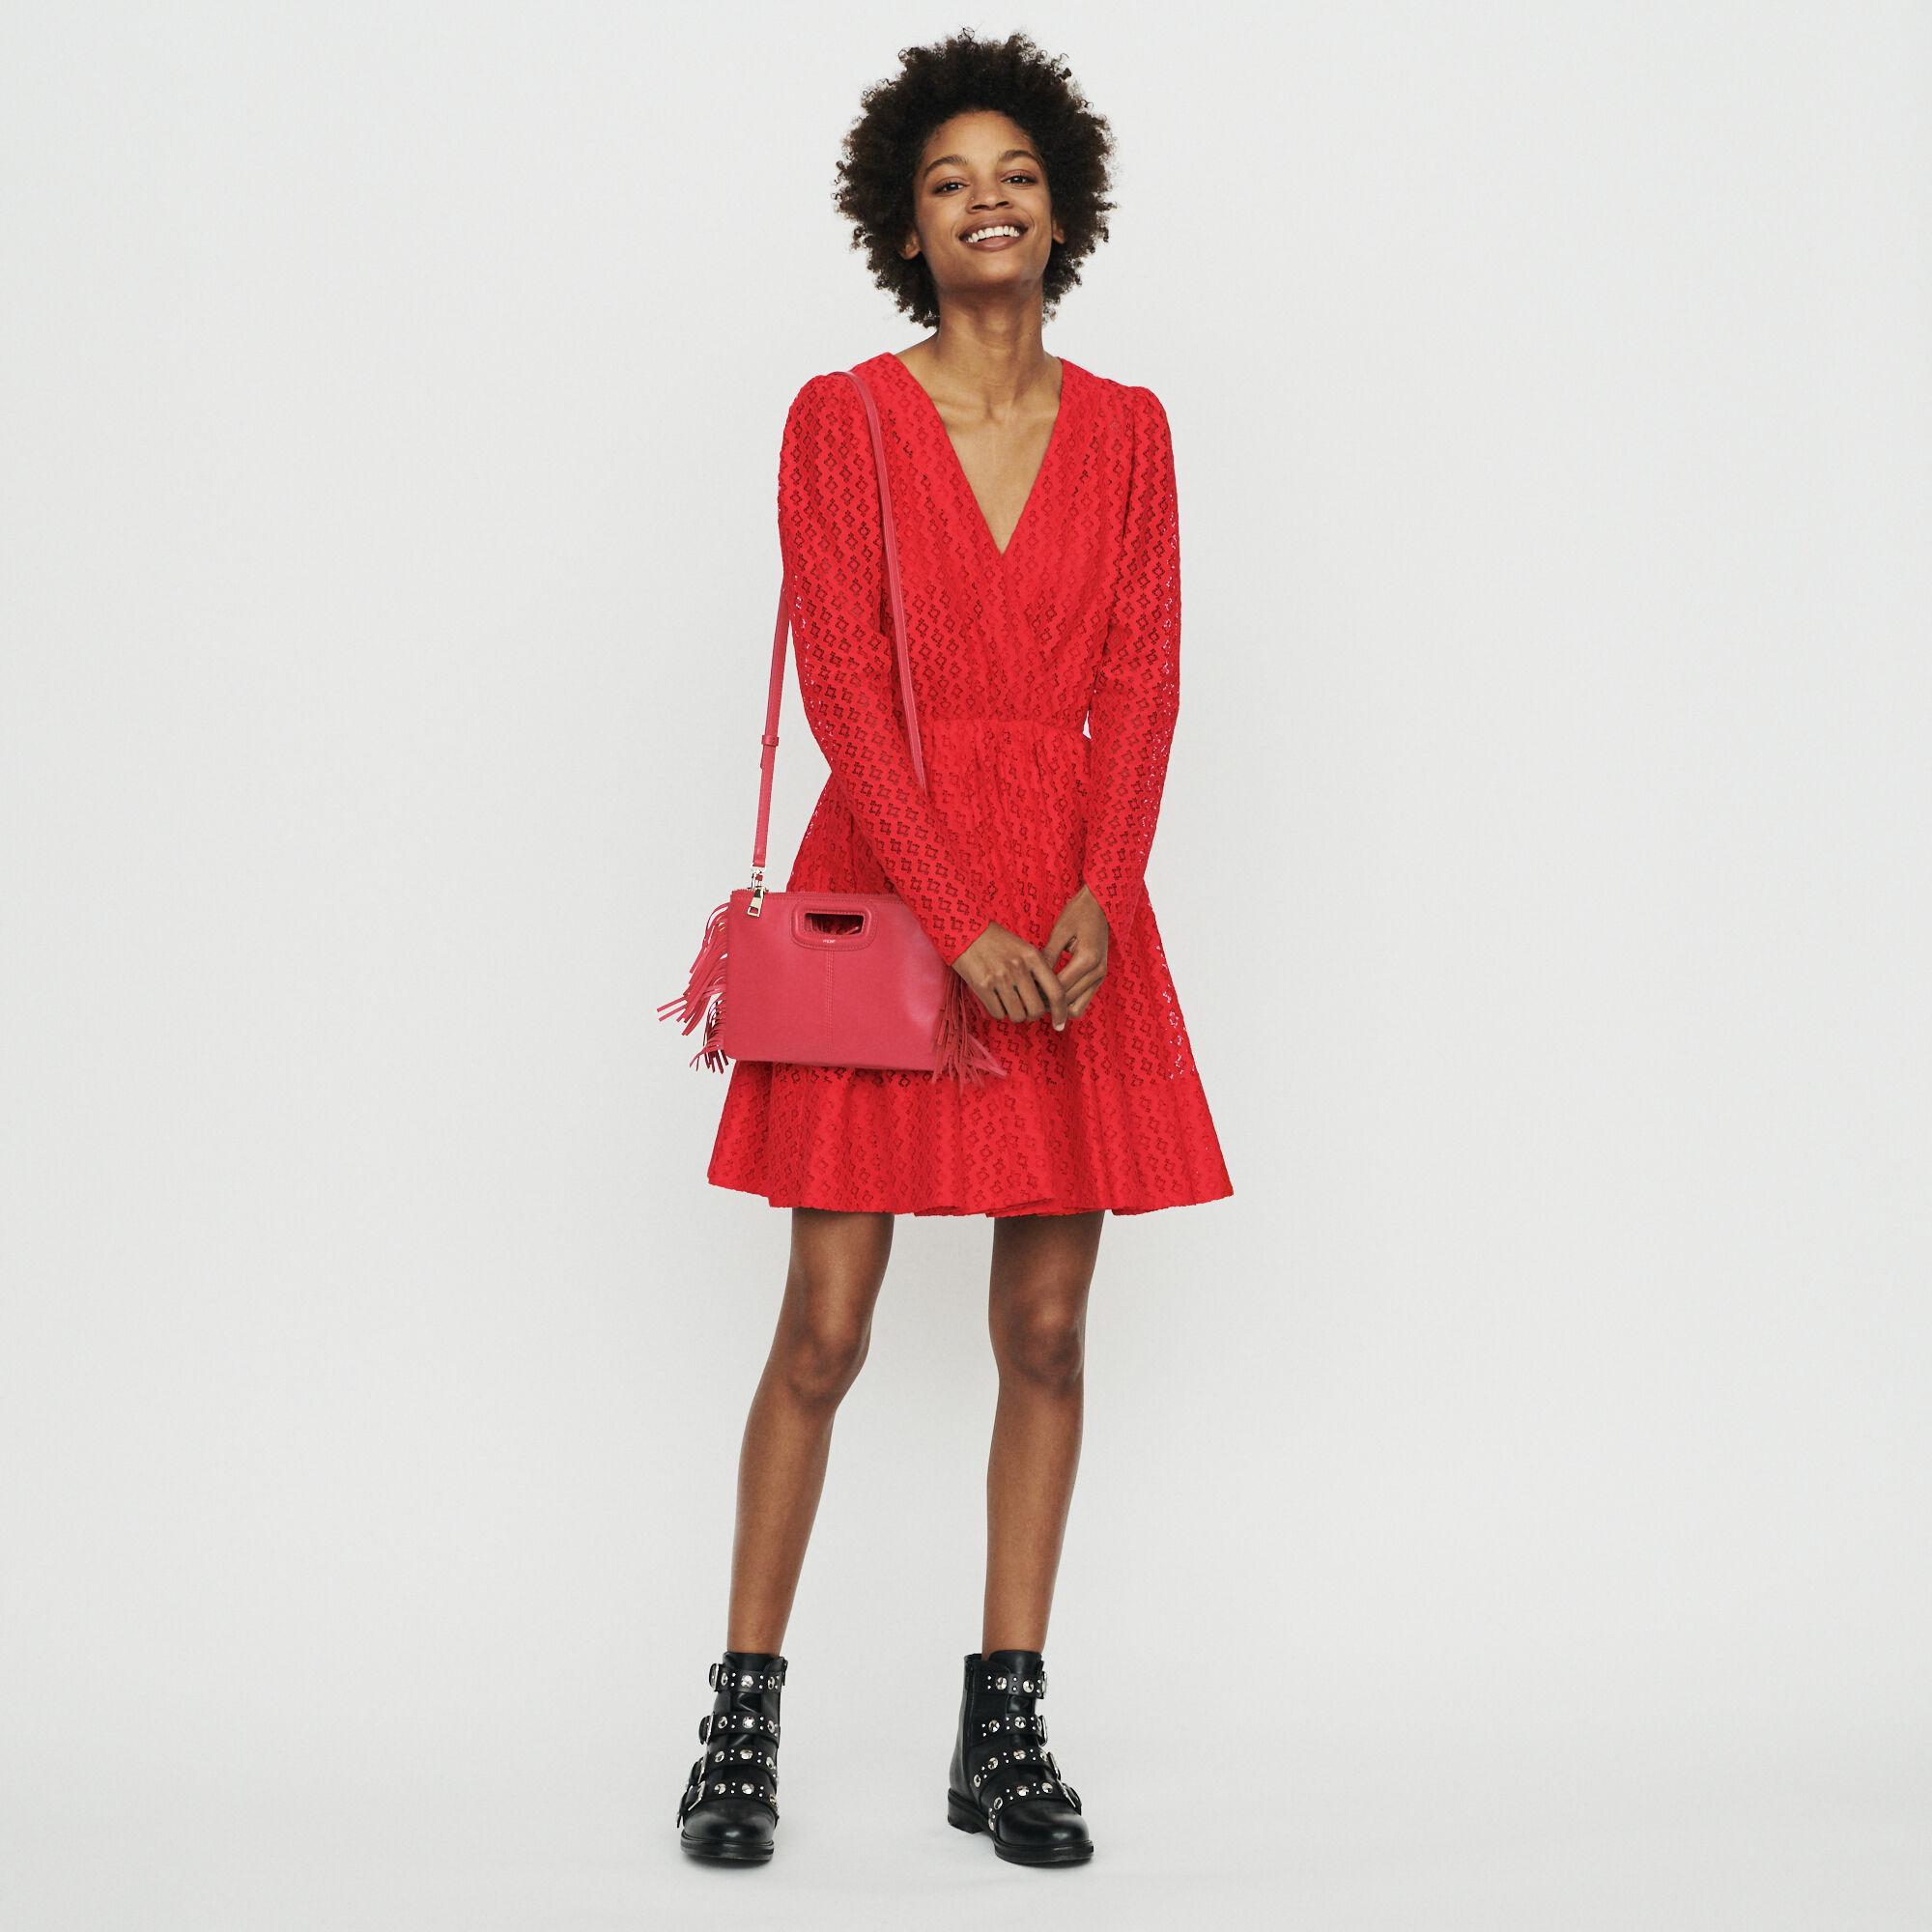 Robe rouge magasin paris